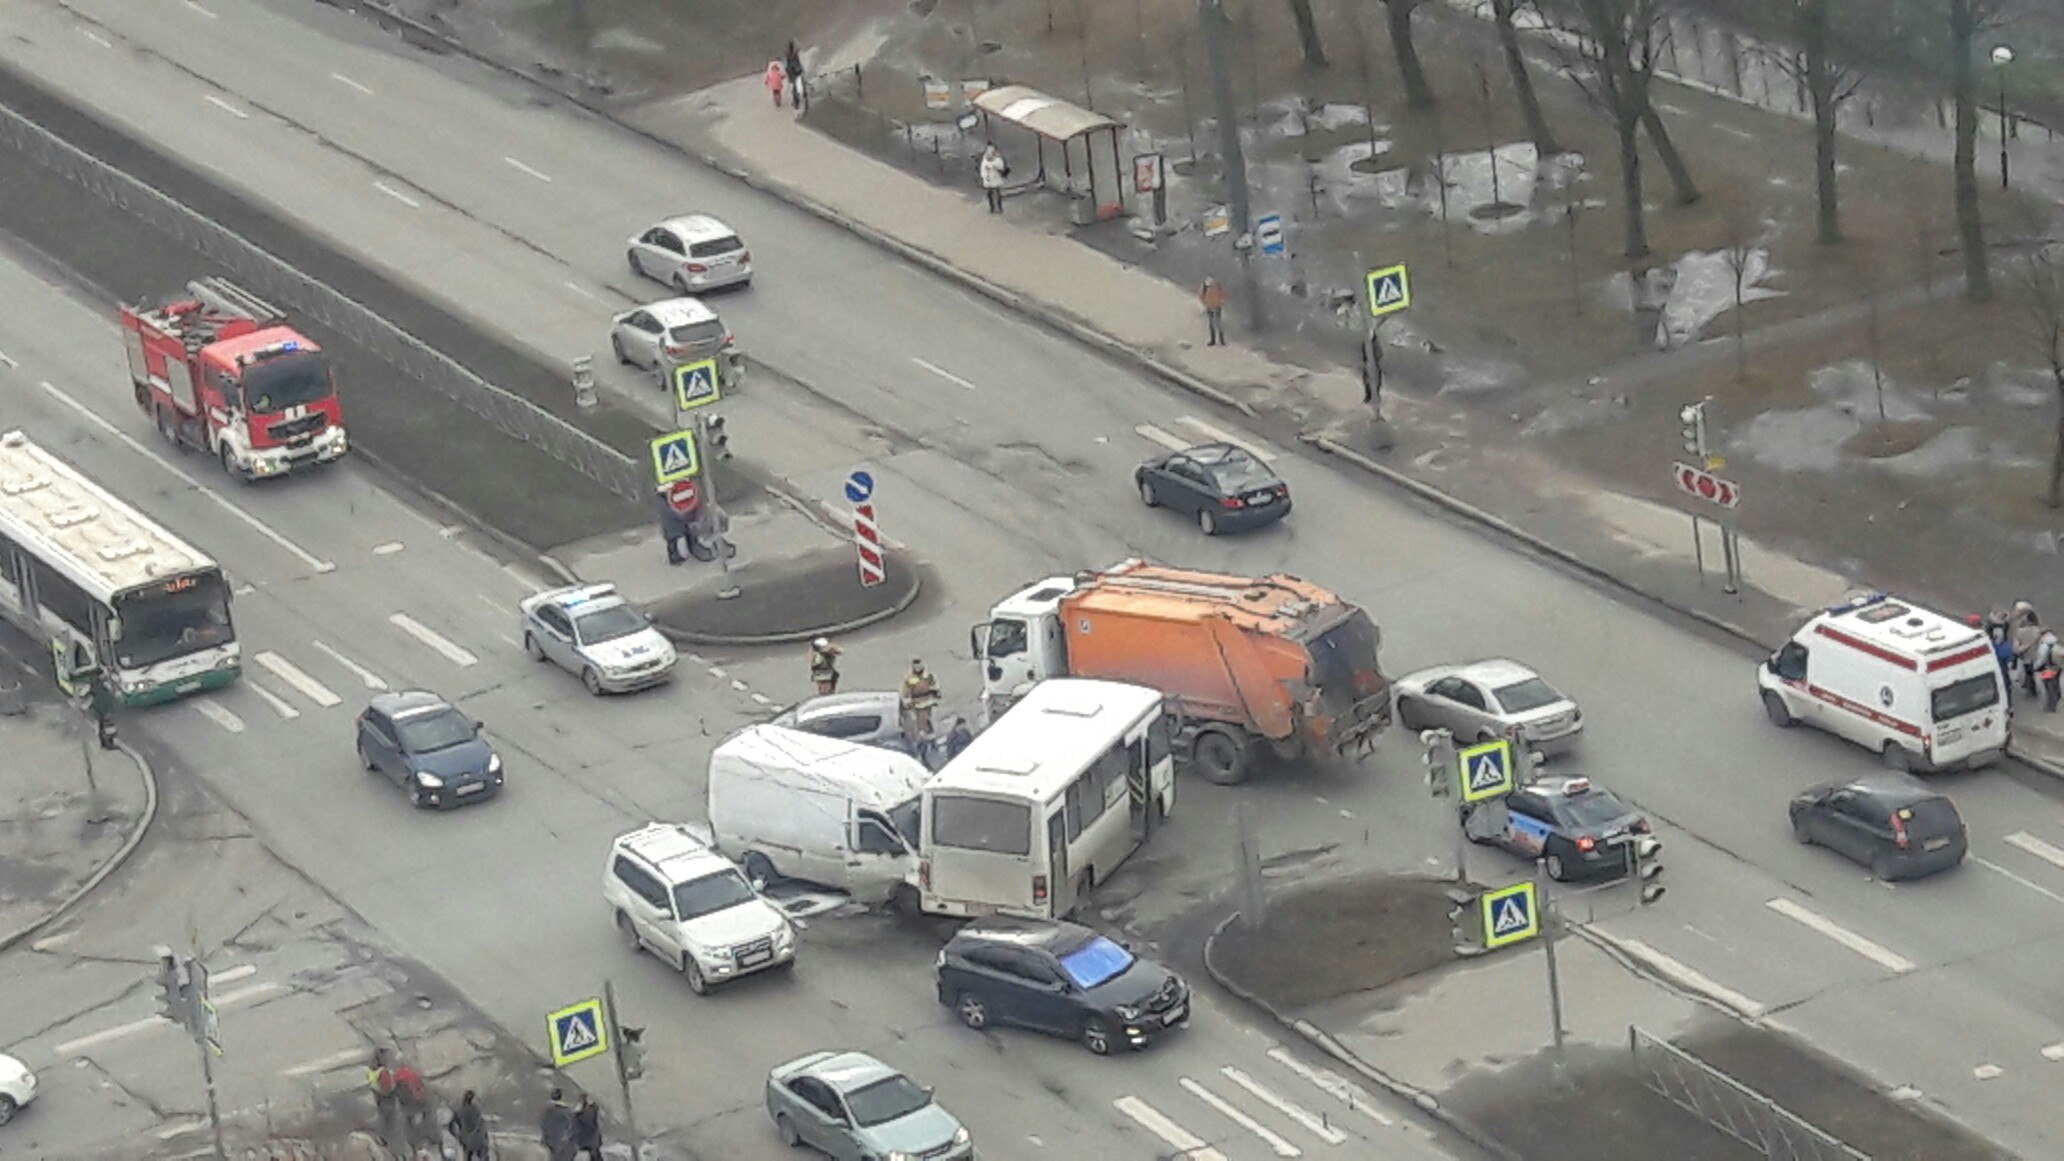 ВПетербурге три человека пострадали встолкновении маршрутки иMercedes